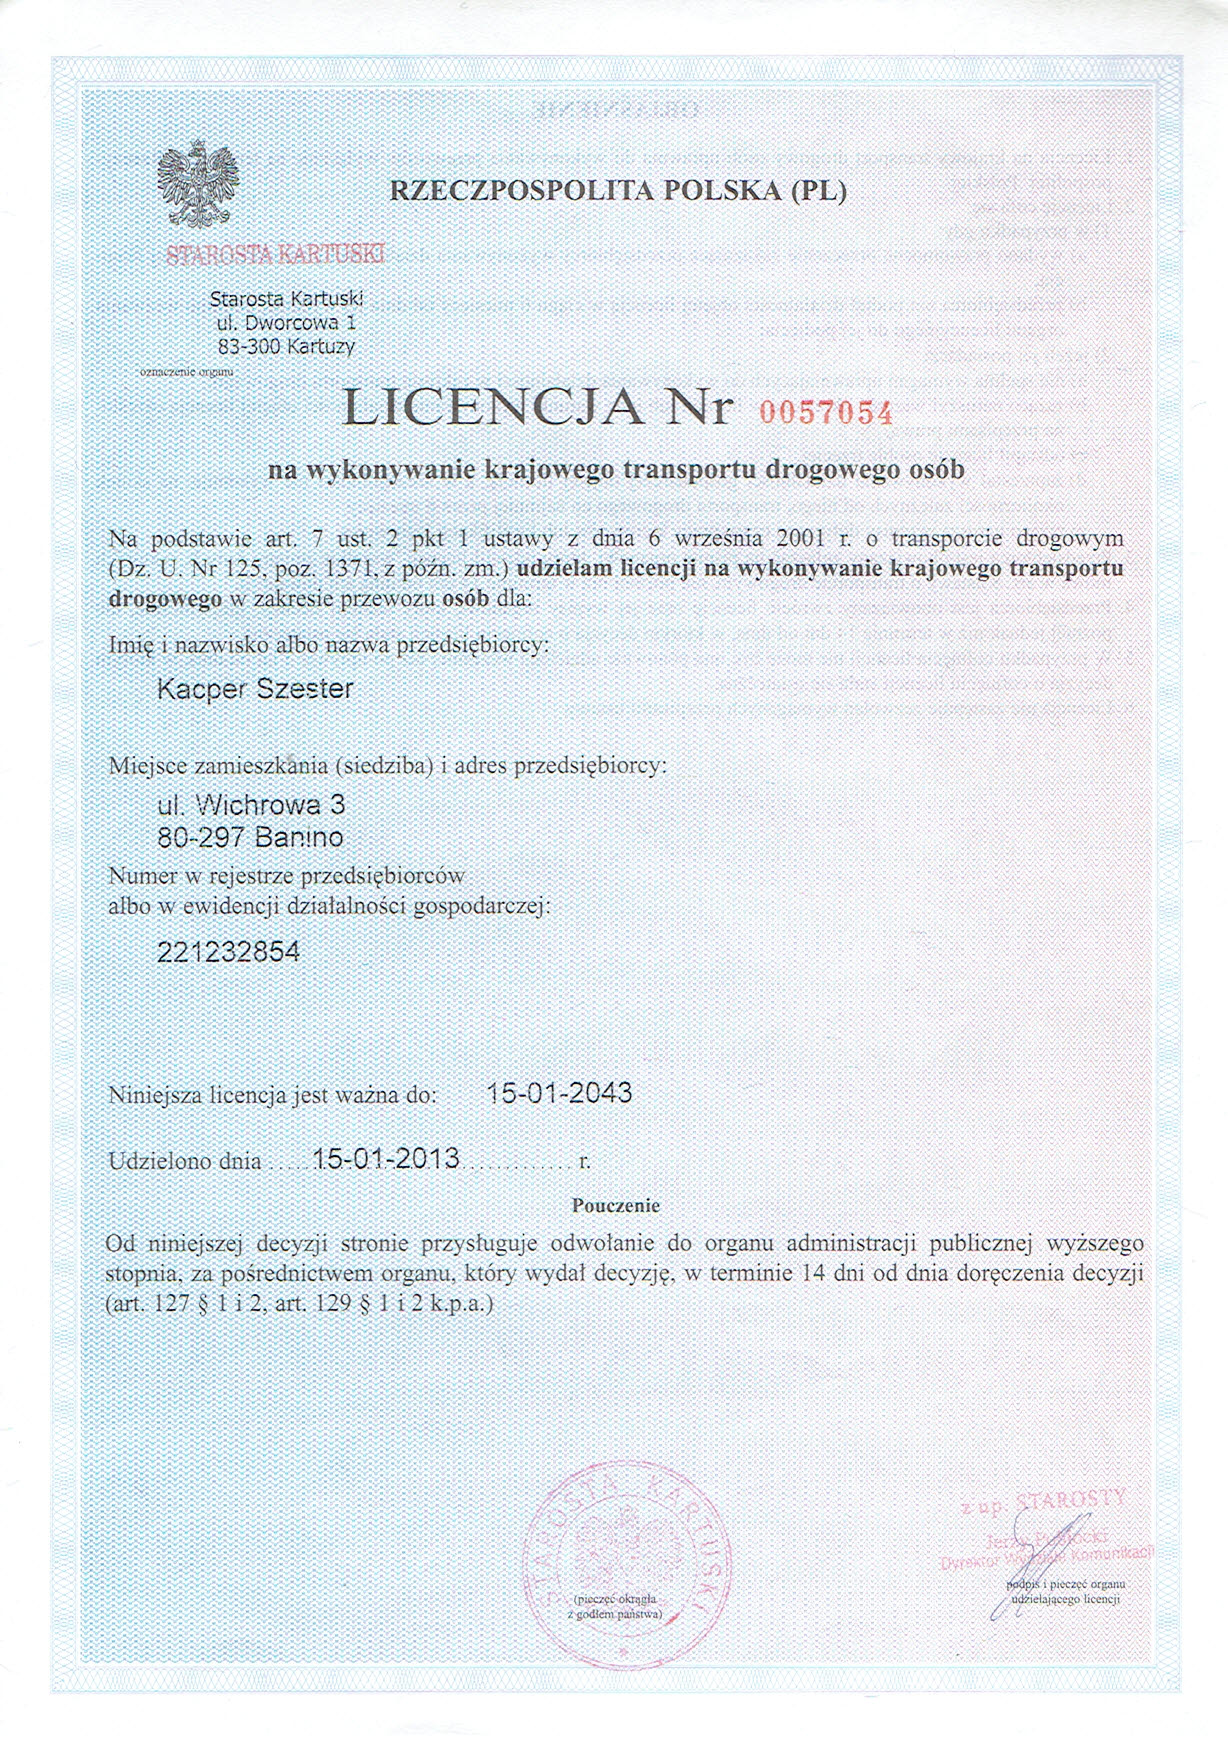 2. Licencja PL